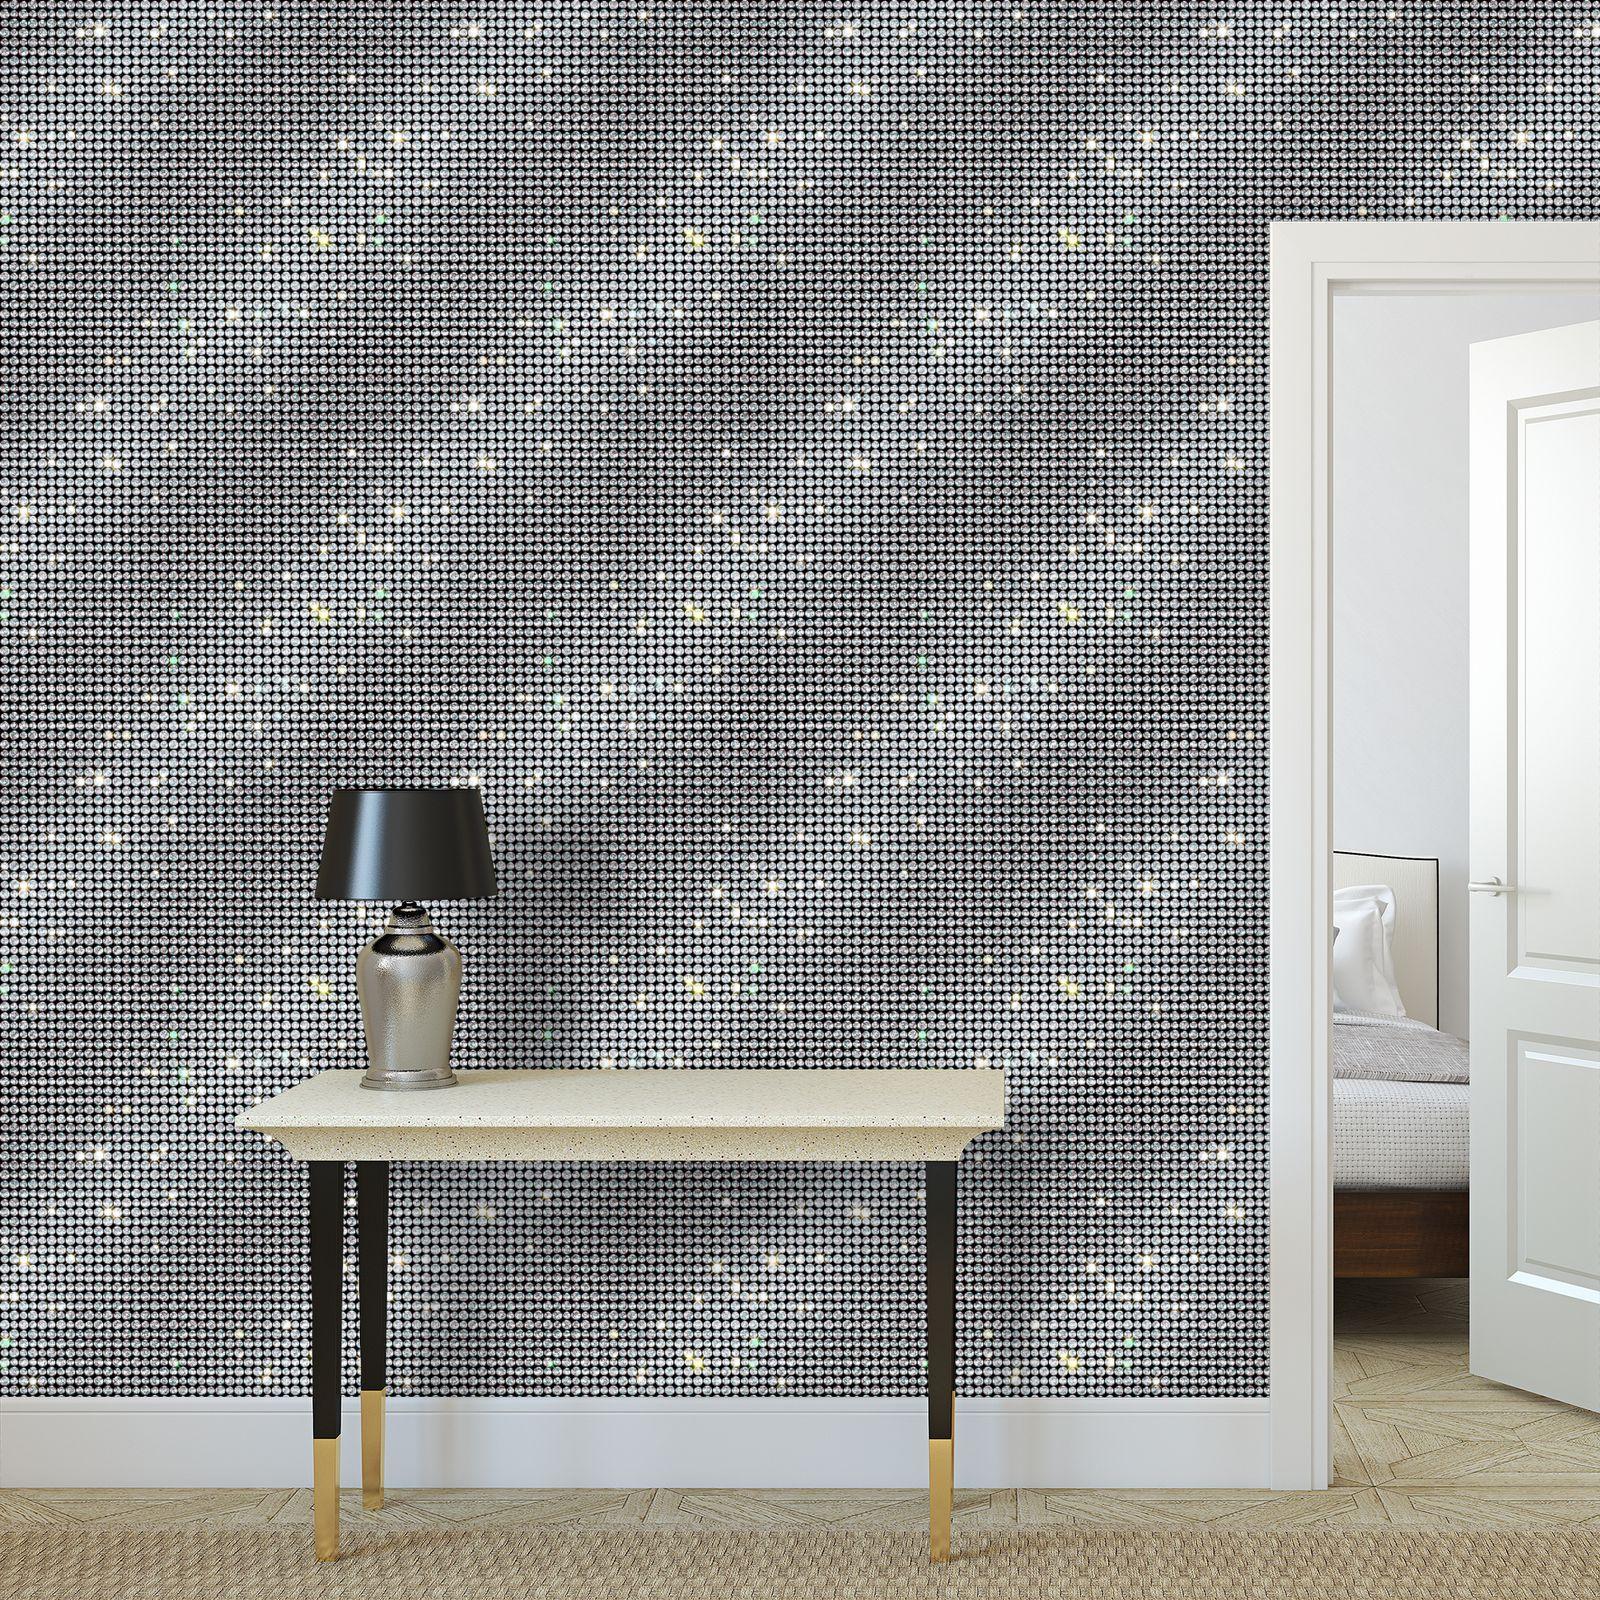 Diamond glamor - Wallpaper Rolls - Brilliant crystals, chic, black and white, sparkling, precious, humor, looks expensive, rhinestones, glitter, jewelery, glamorous fun gift - design by Tiana Lofd